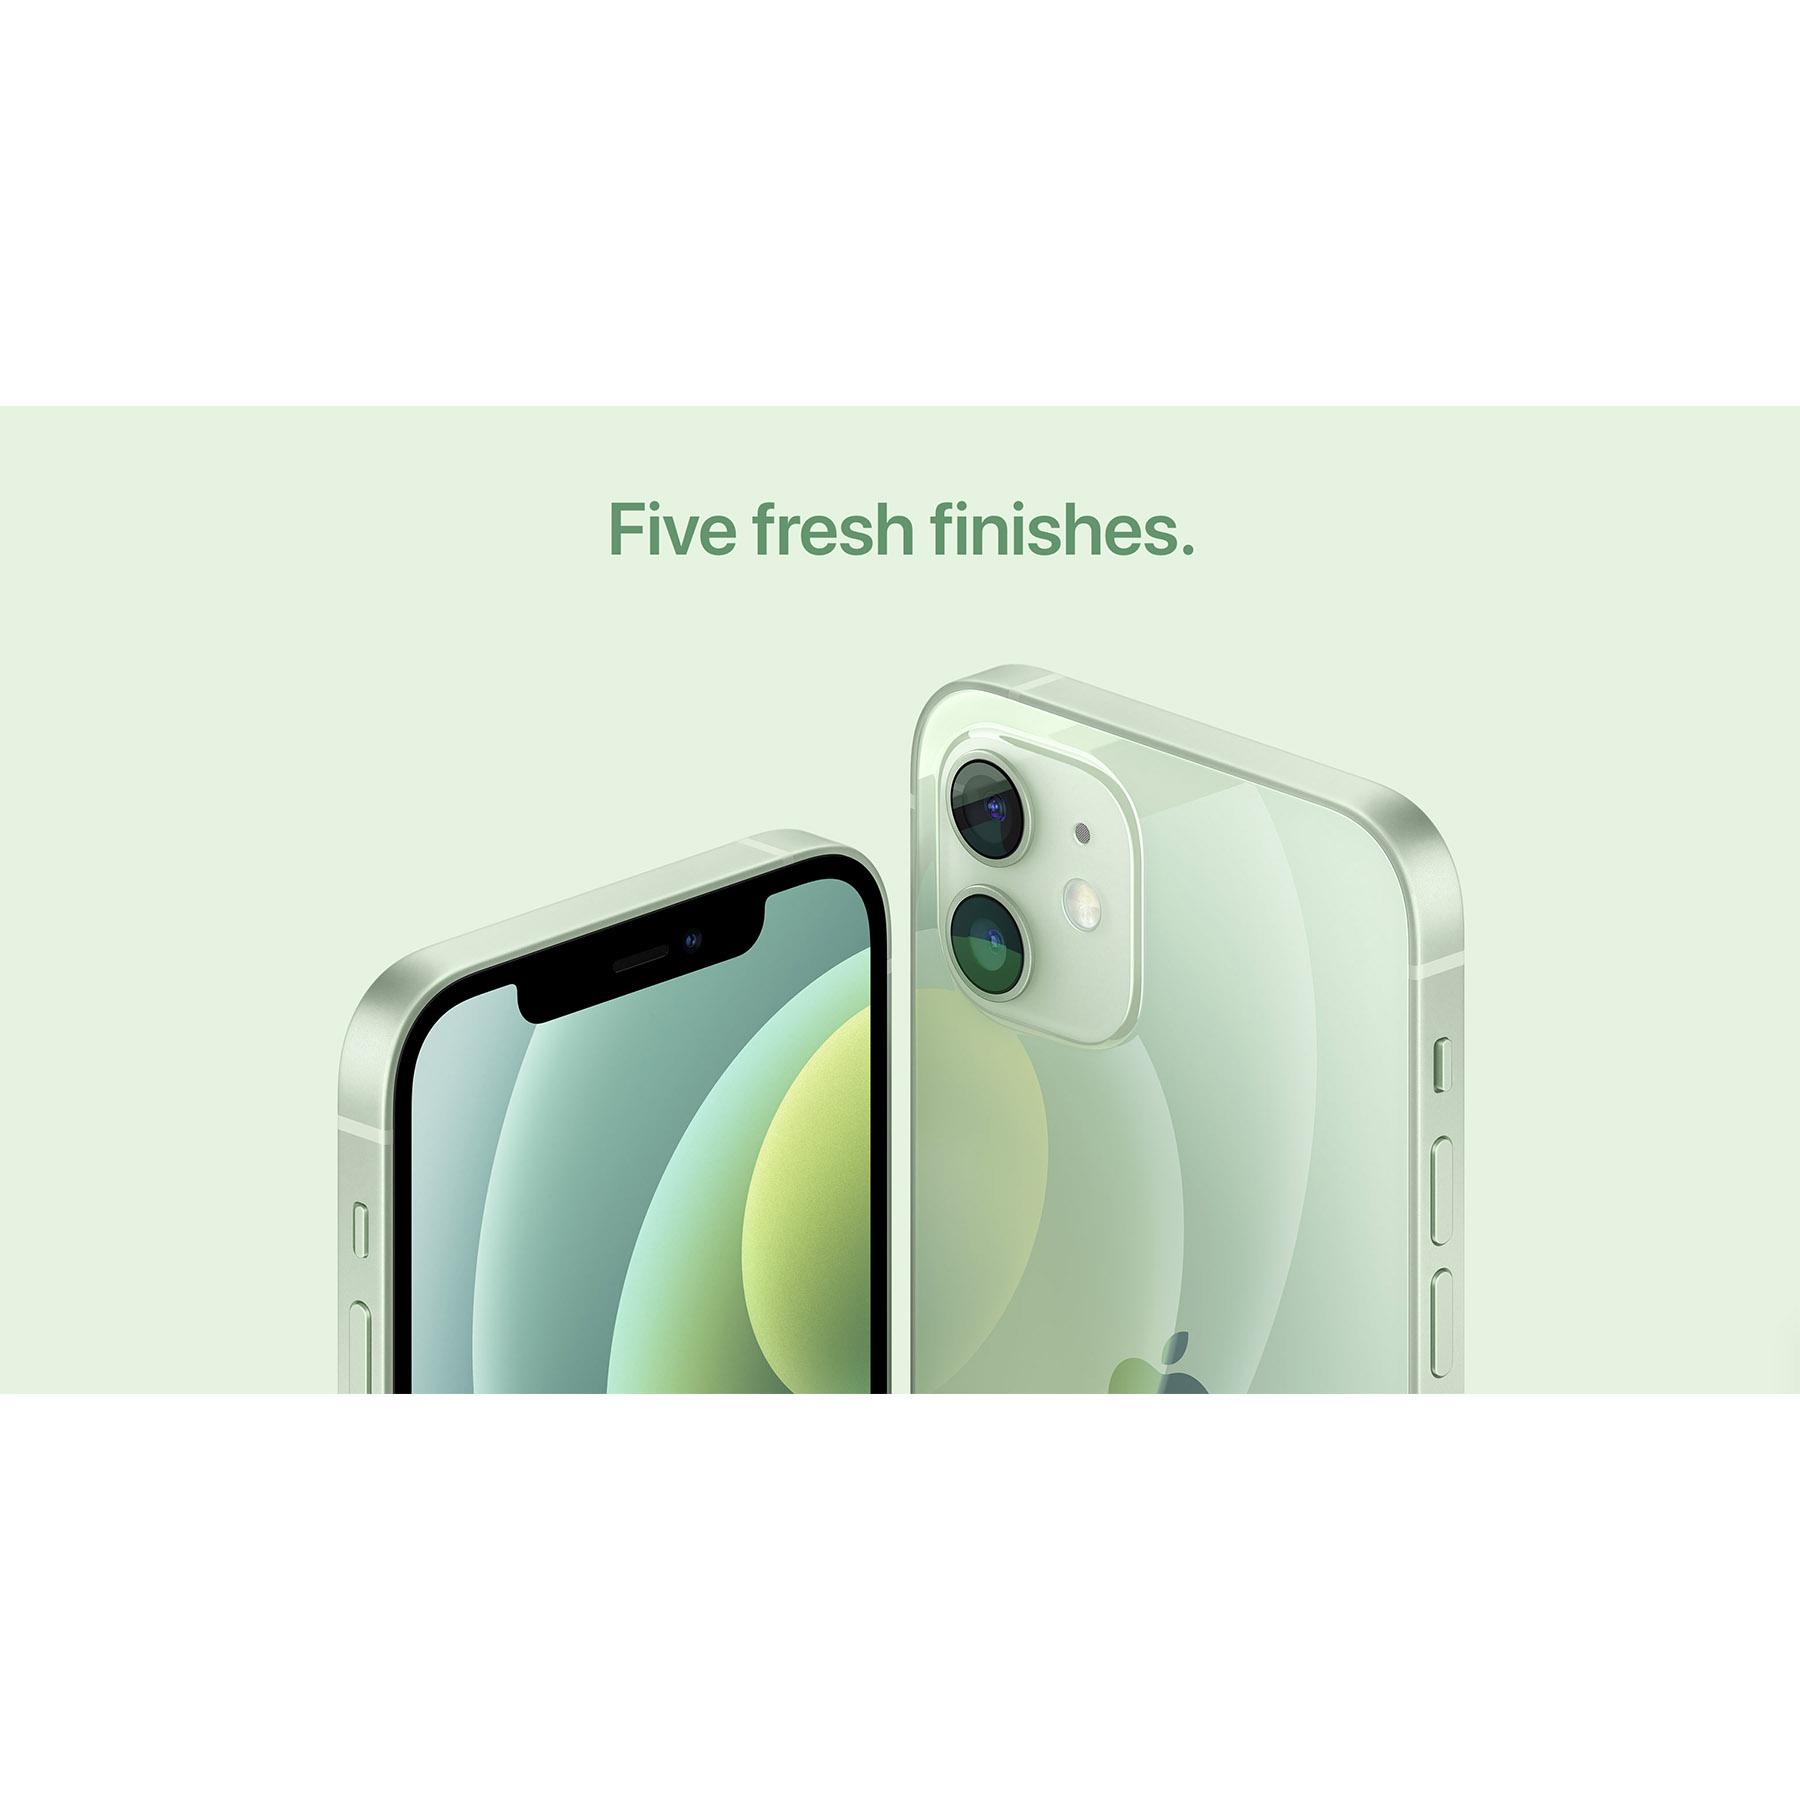 گوشی موبایل اپل مدل iPhone 12 A2404 دو سیم کارت ظرفیت 256 گیگابایت  main 1 11